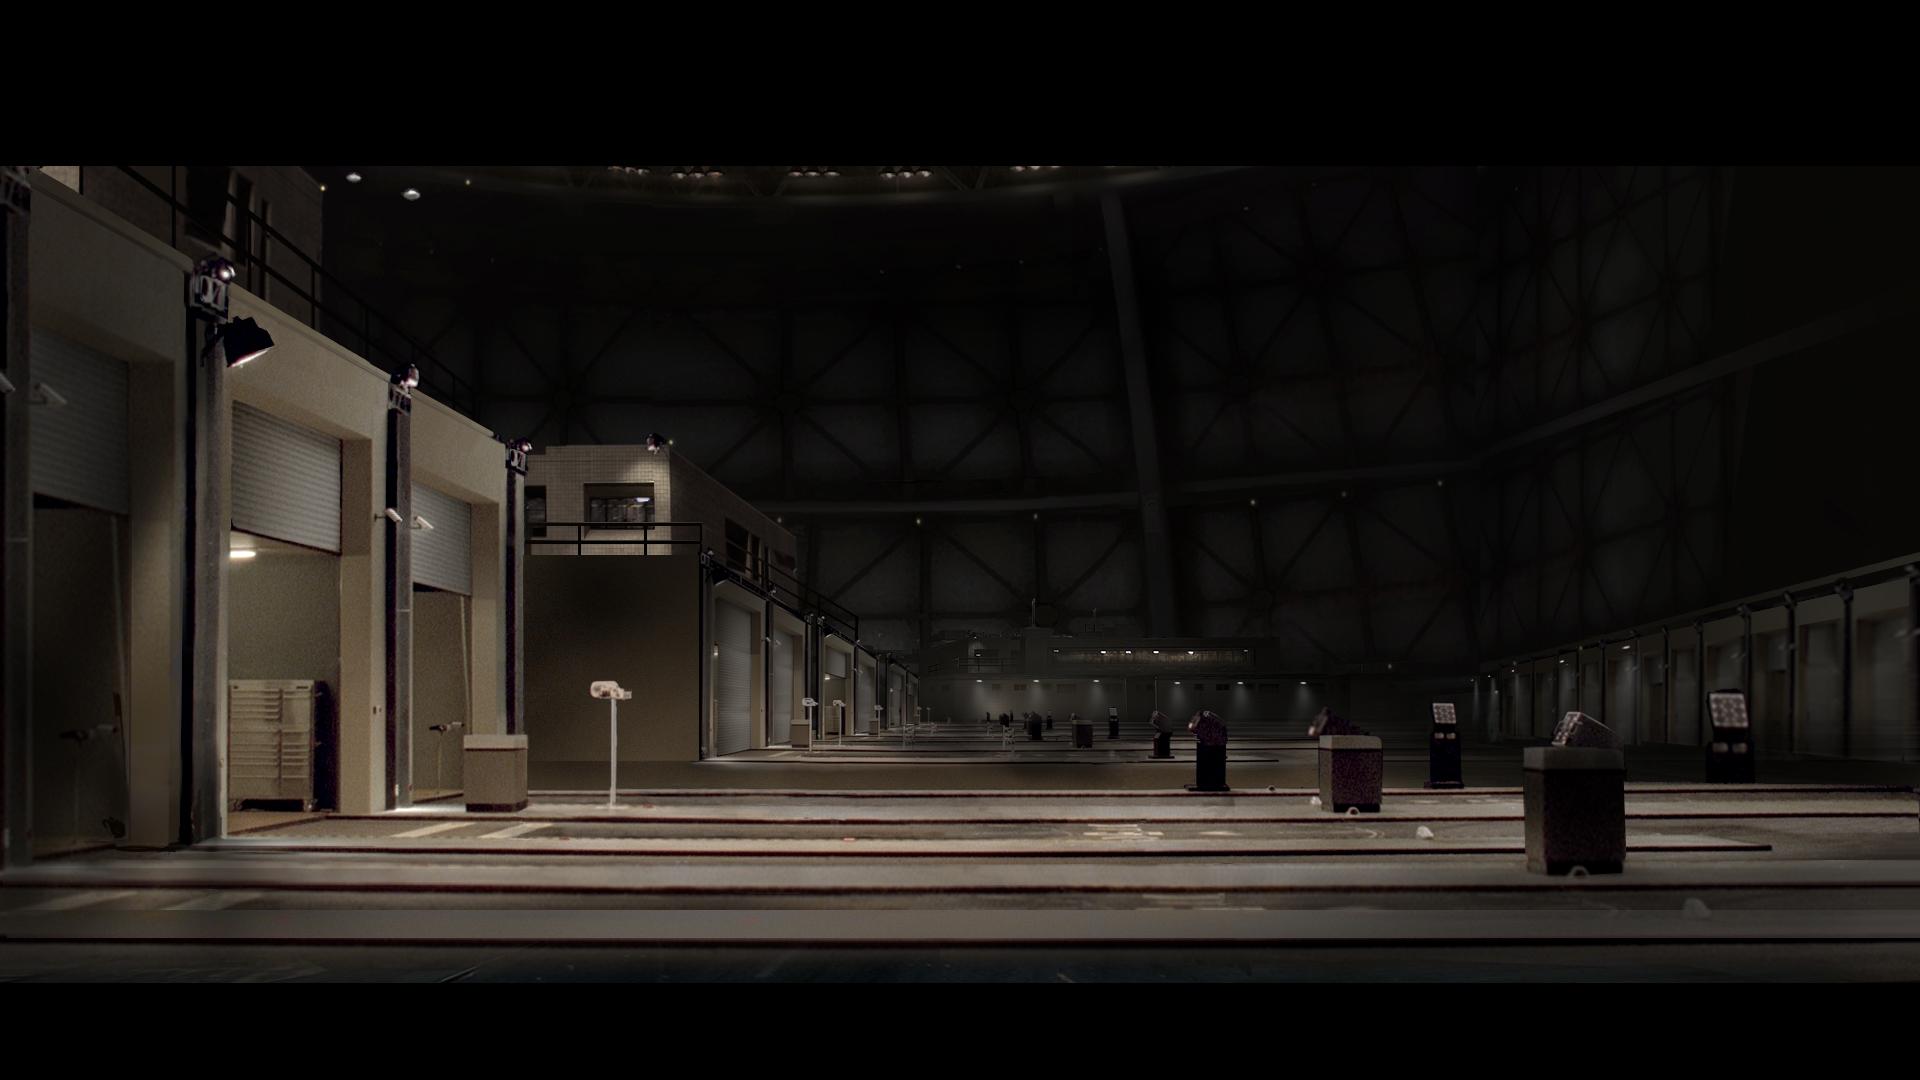 warehouse_interior_02.jpg